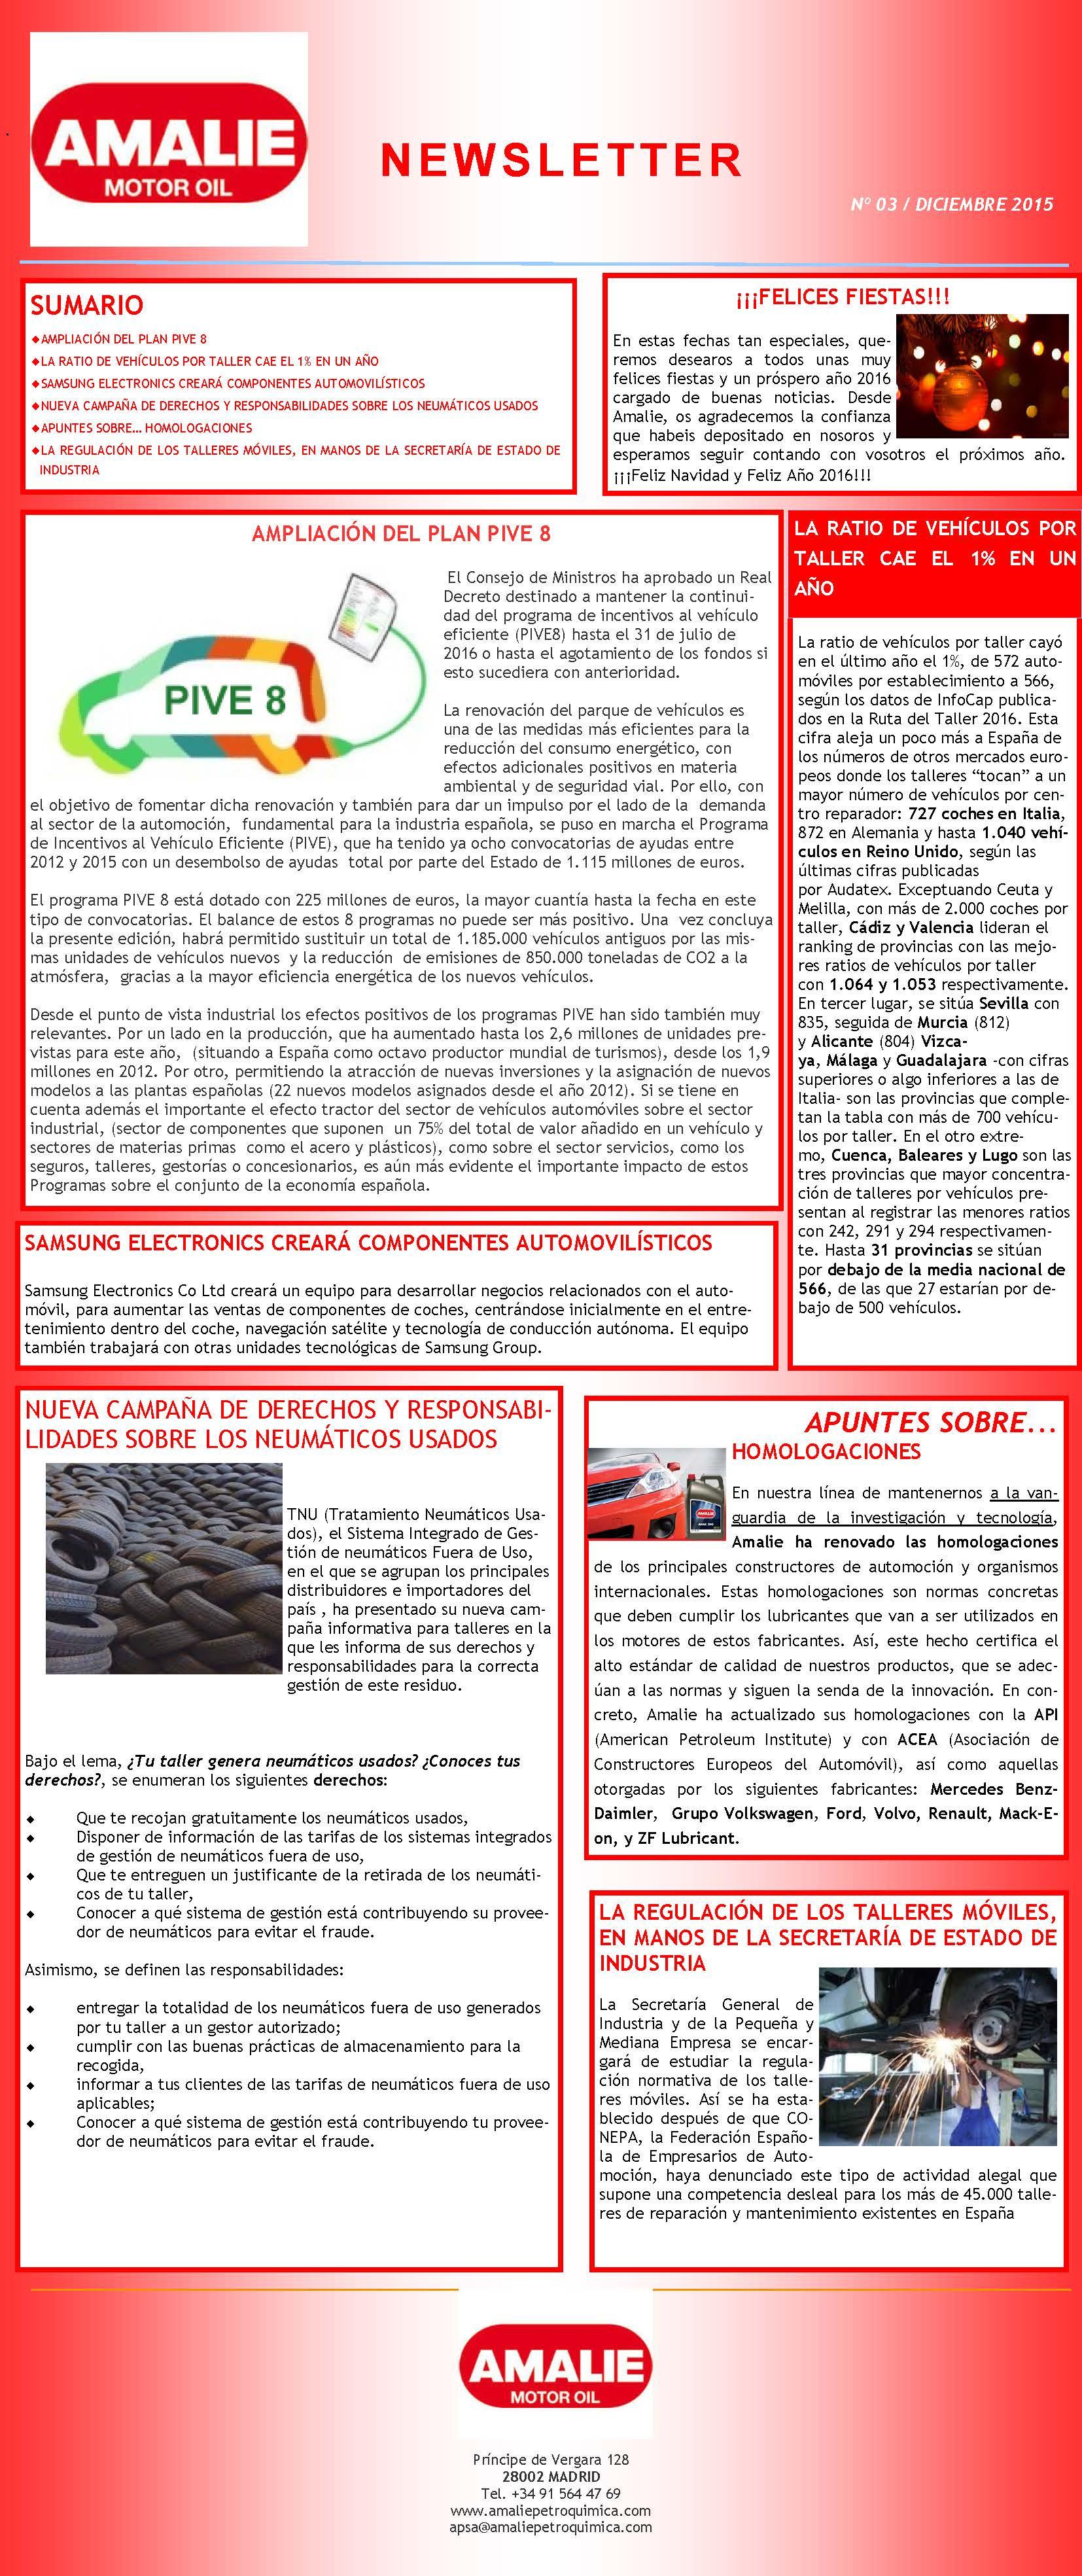 newsletter-amalie-diciembre-2015